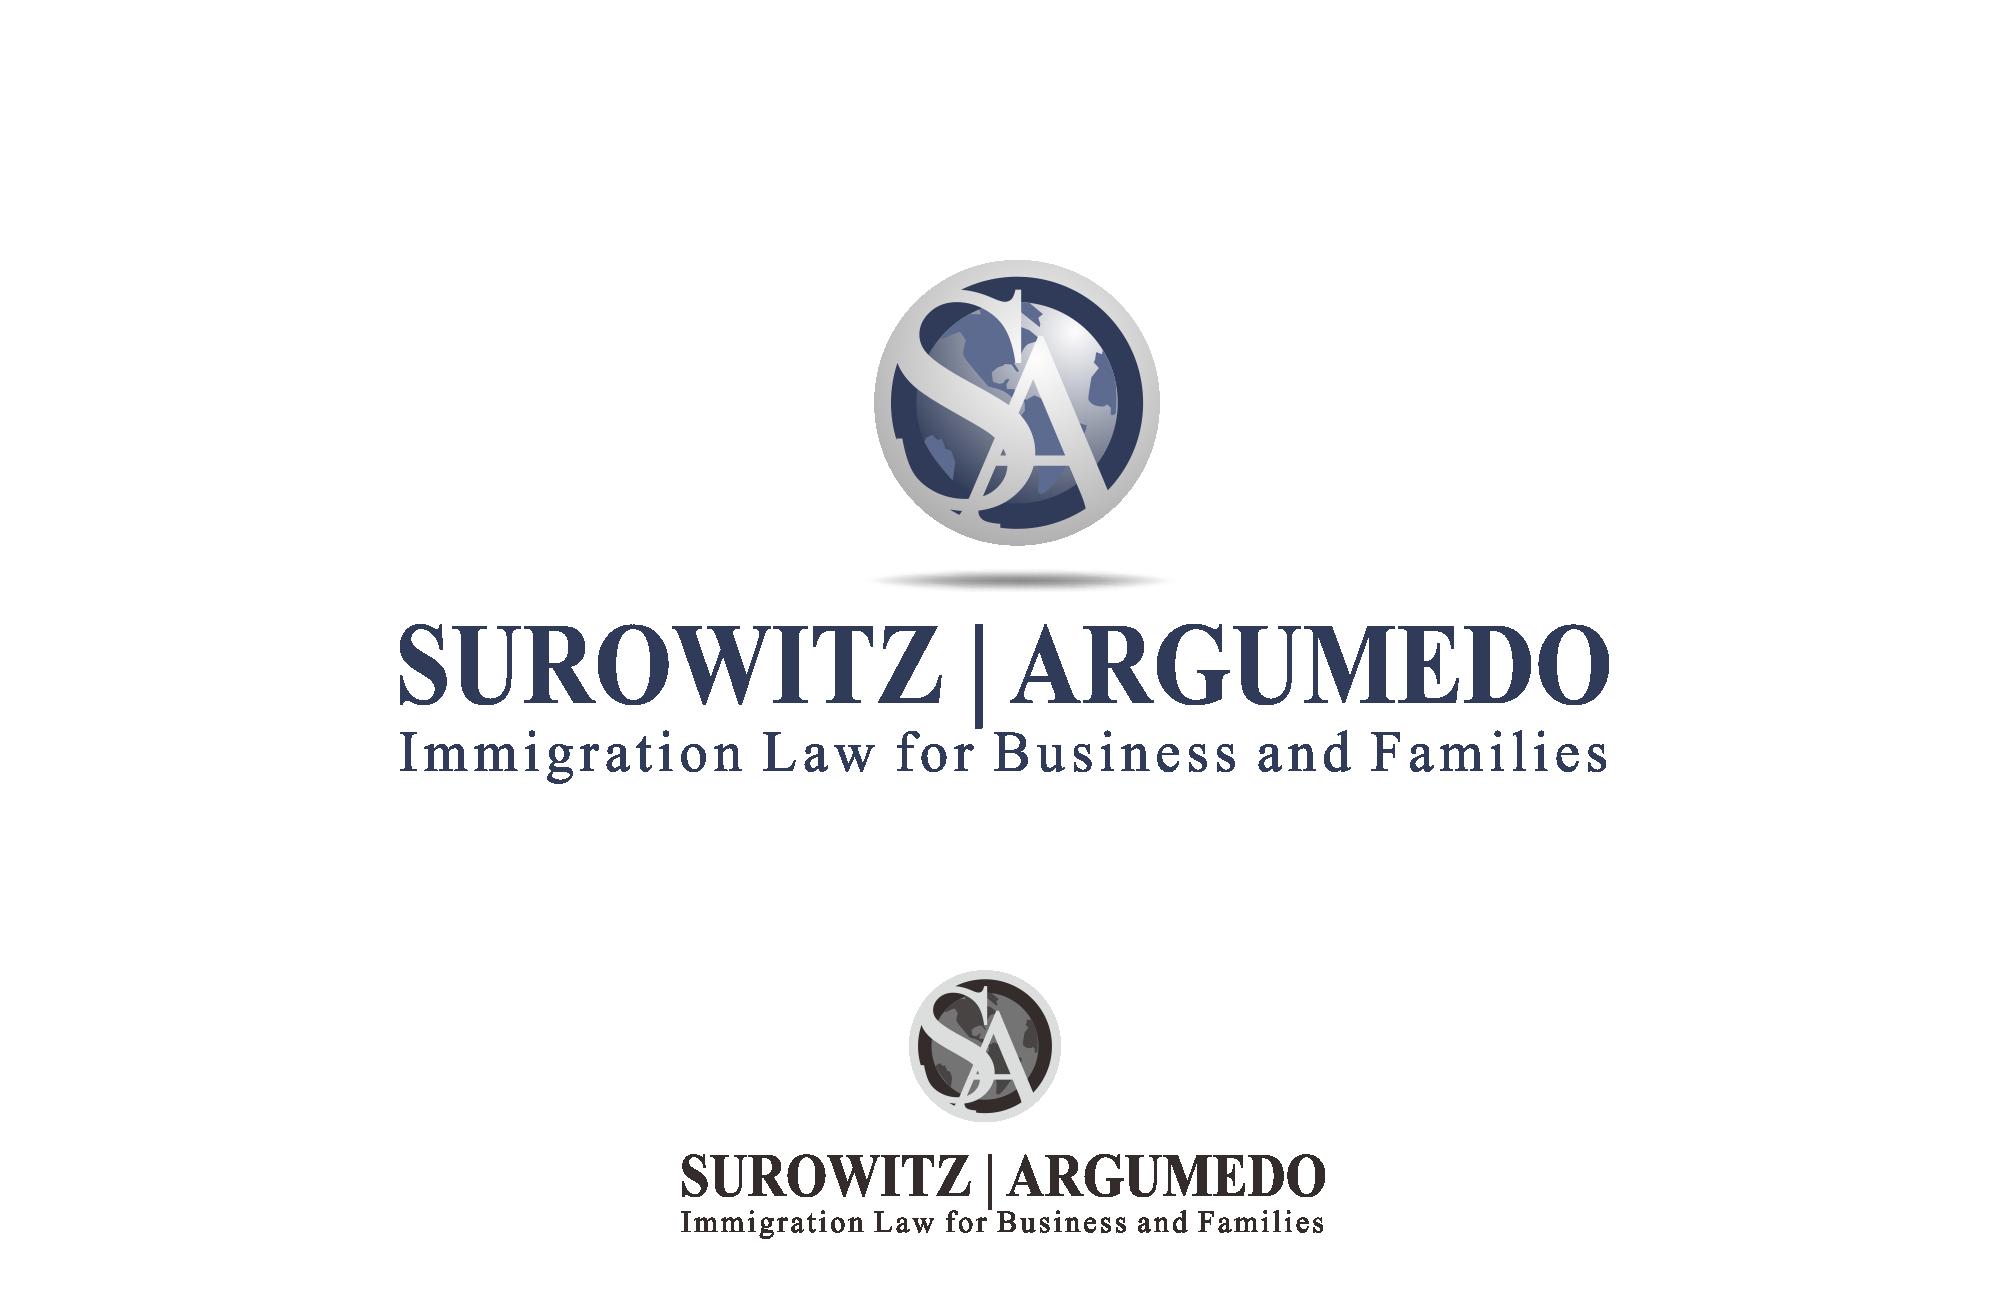 Create the next logo for Surowitz | Argumedo